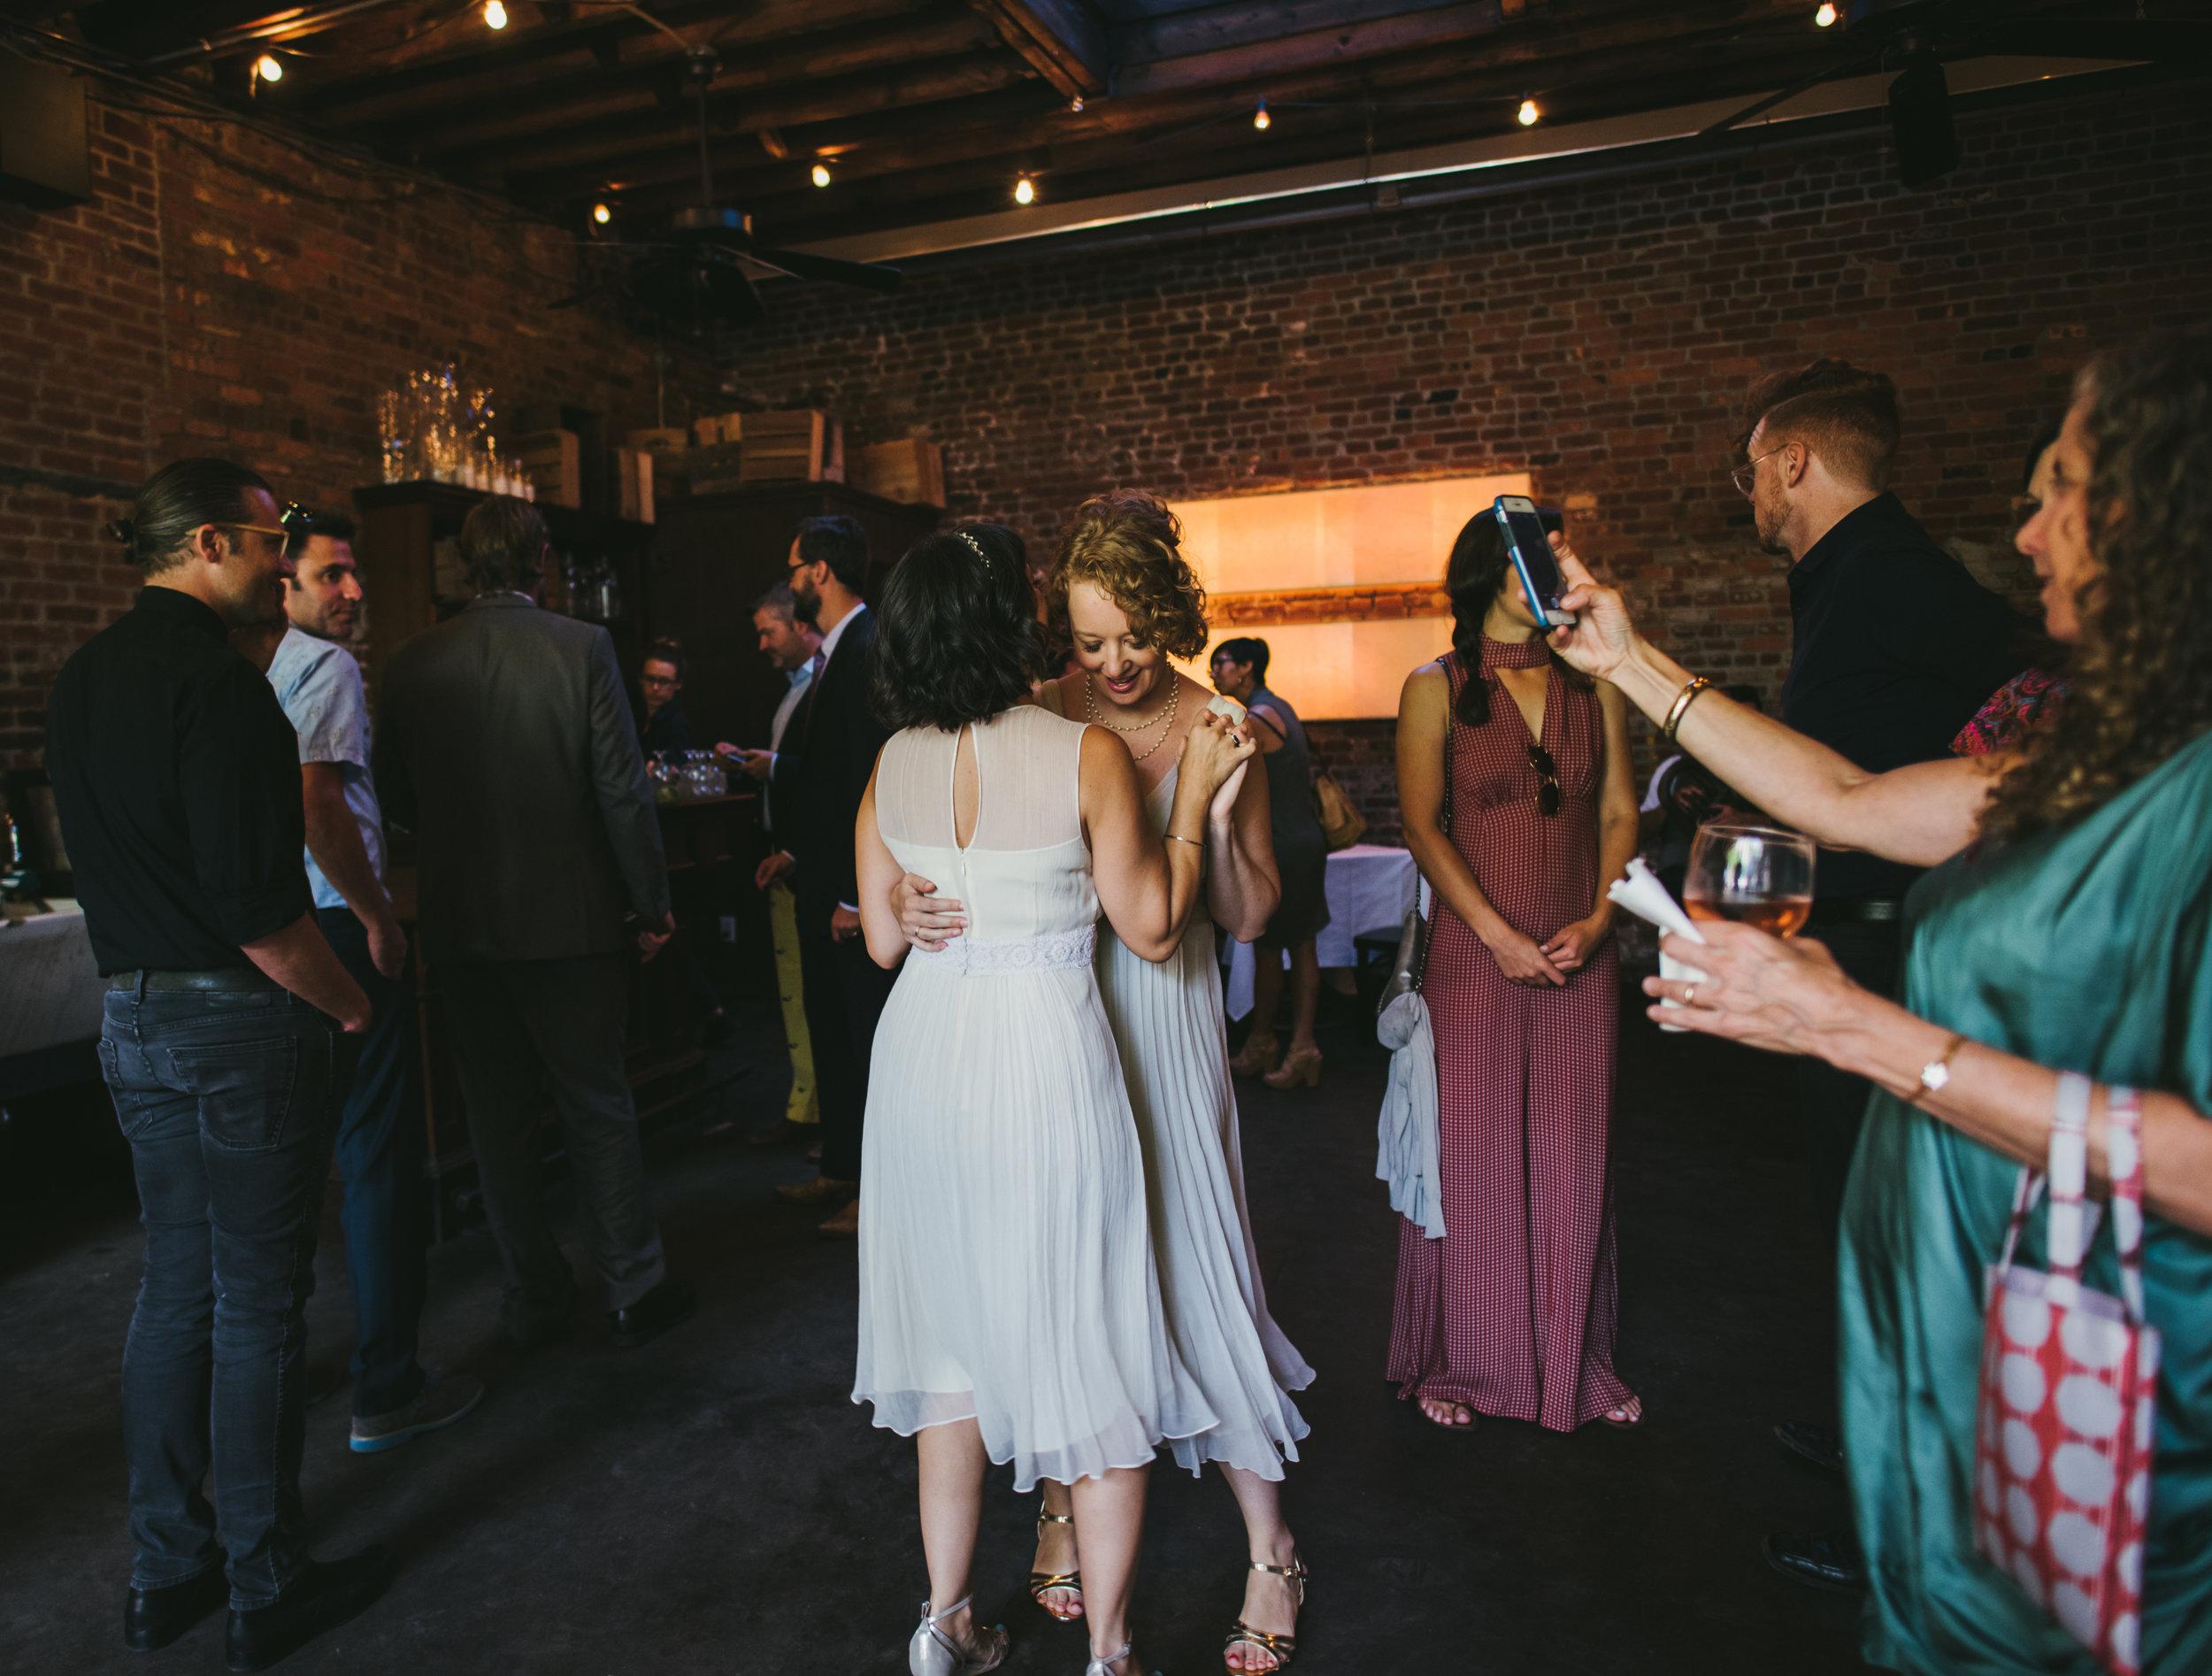 NANCY & CARA - FRANKIES 457 SPUNTINO - BROOKLYN INTIMATE WEDDING by CHI-CHI ARI-270.jpg